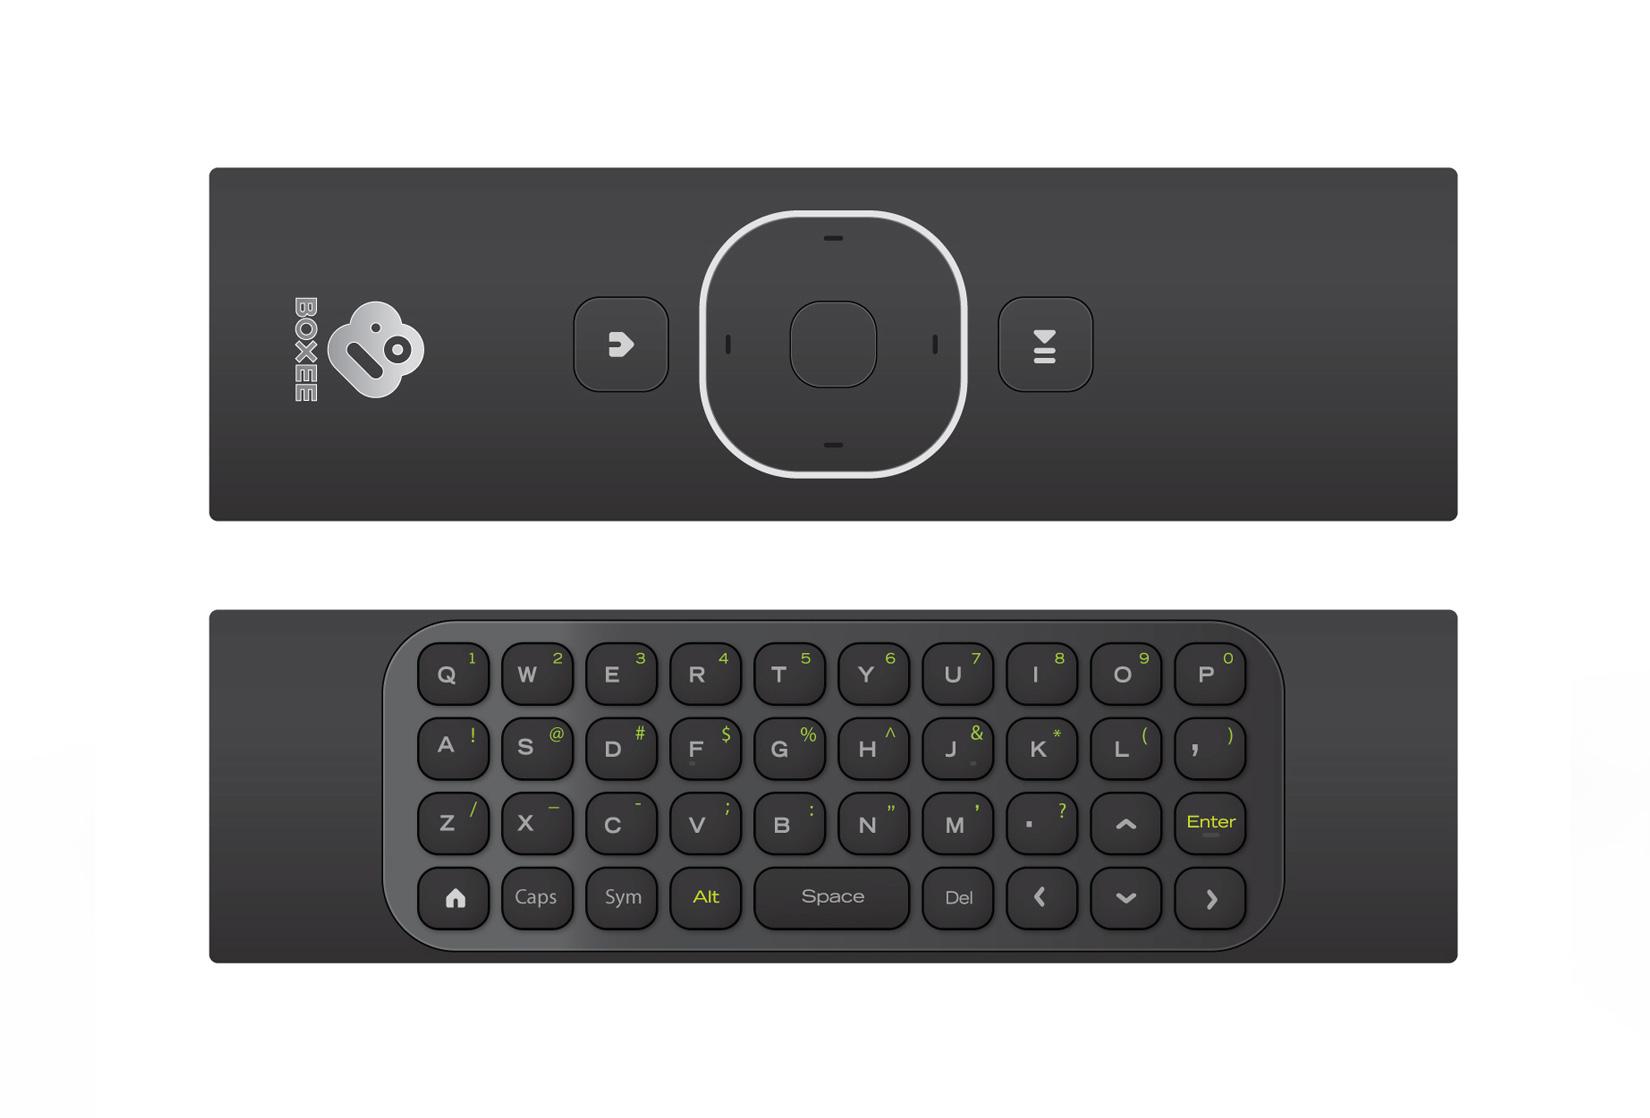 D-Link's Boxee Box Remote